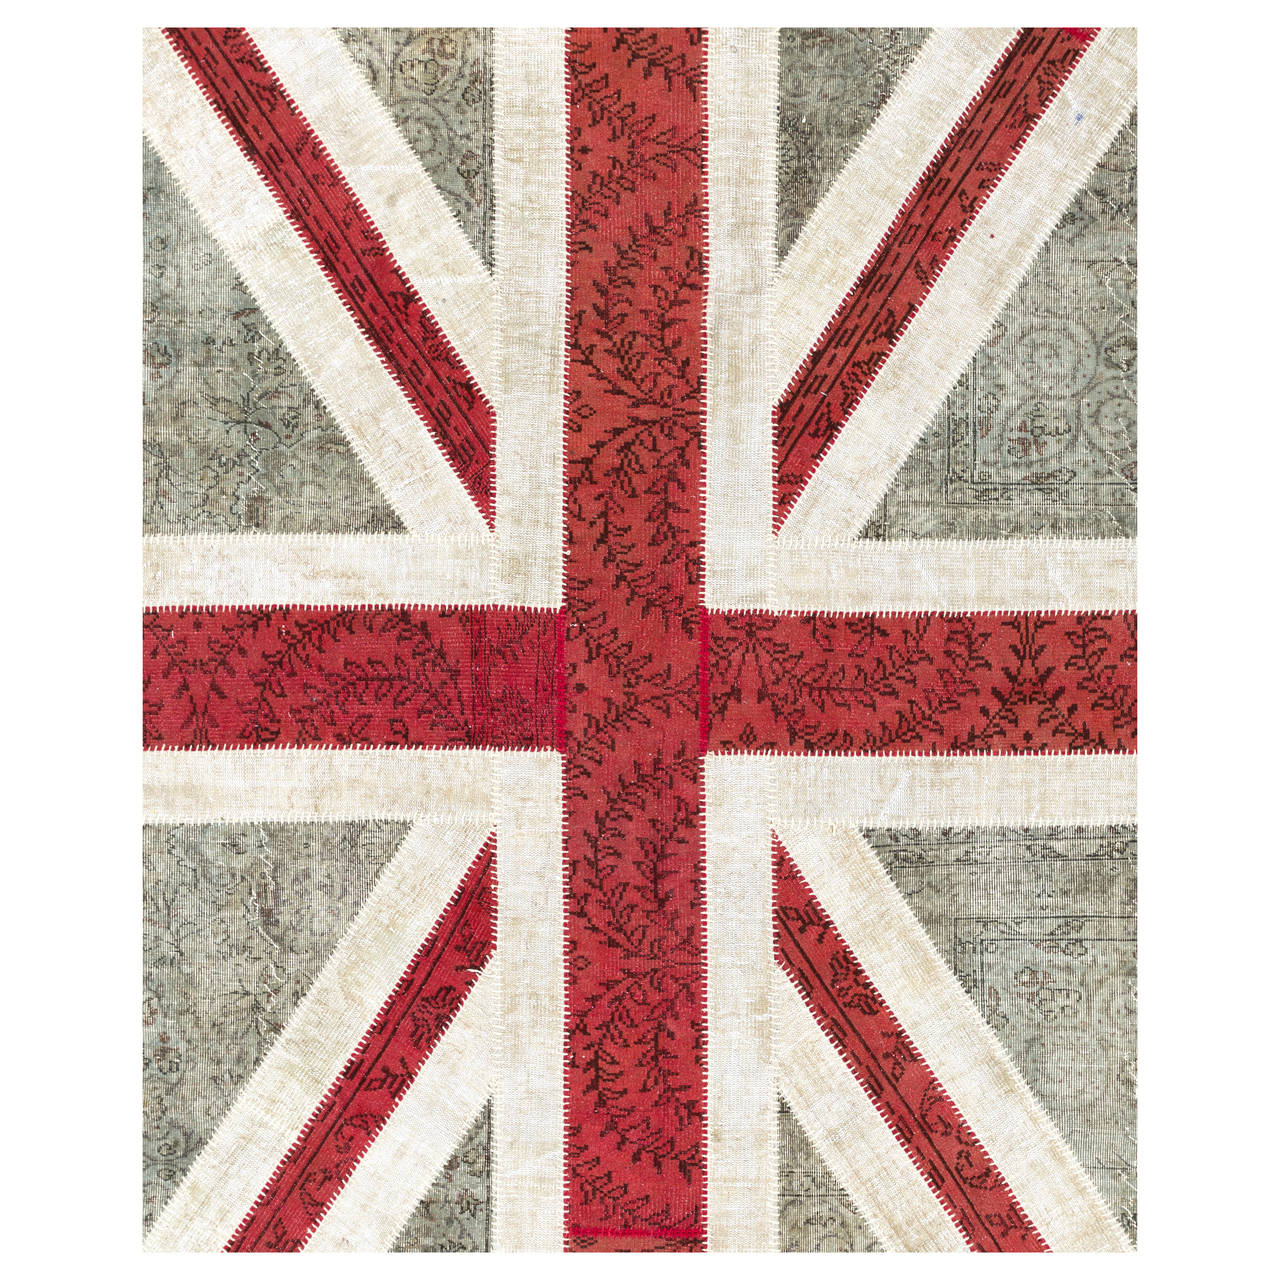 Union Jack Design Patchwork Rug Made From Distressed Vintage Carpets 1